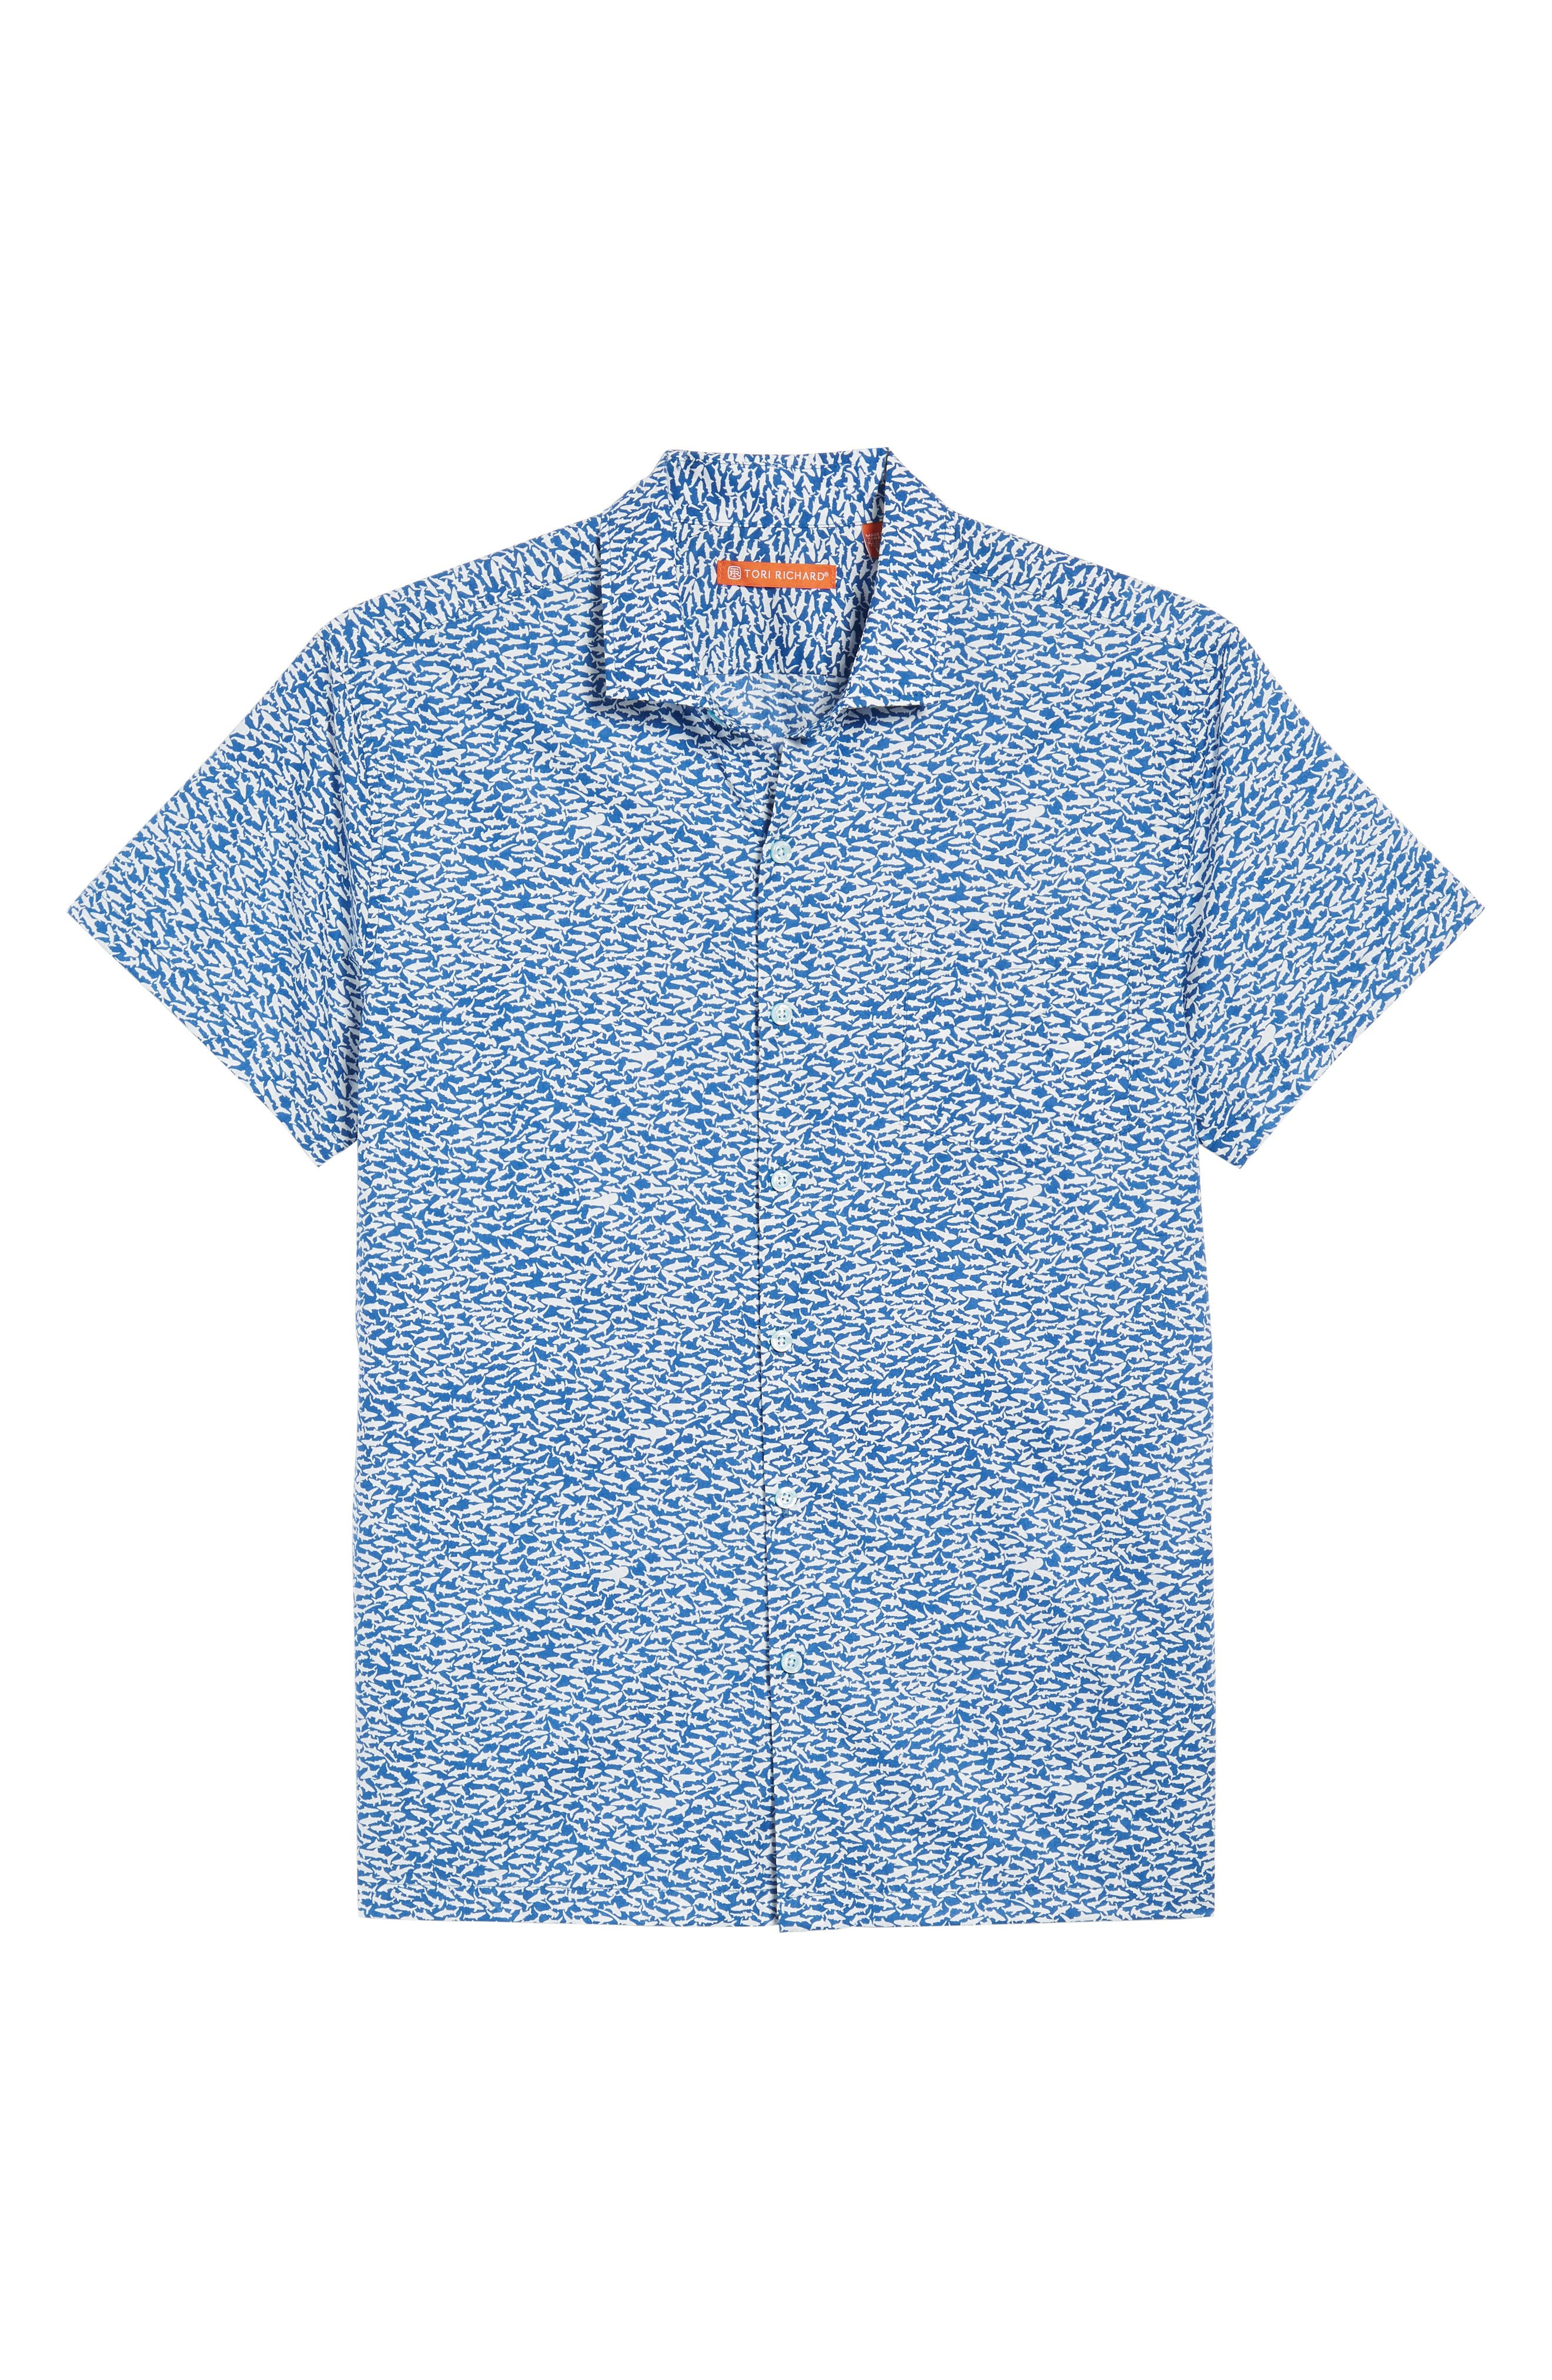 TORI RICHARD, Shark Tank Trim Fit Camp Shirt, Alternate thumbnail 6, color, MARINA